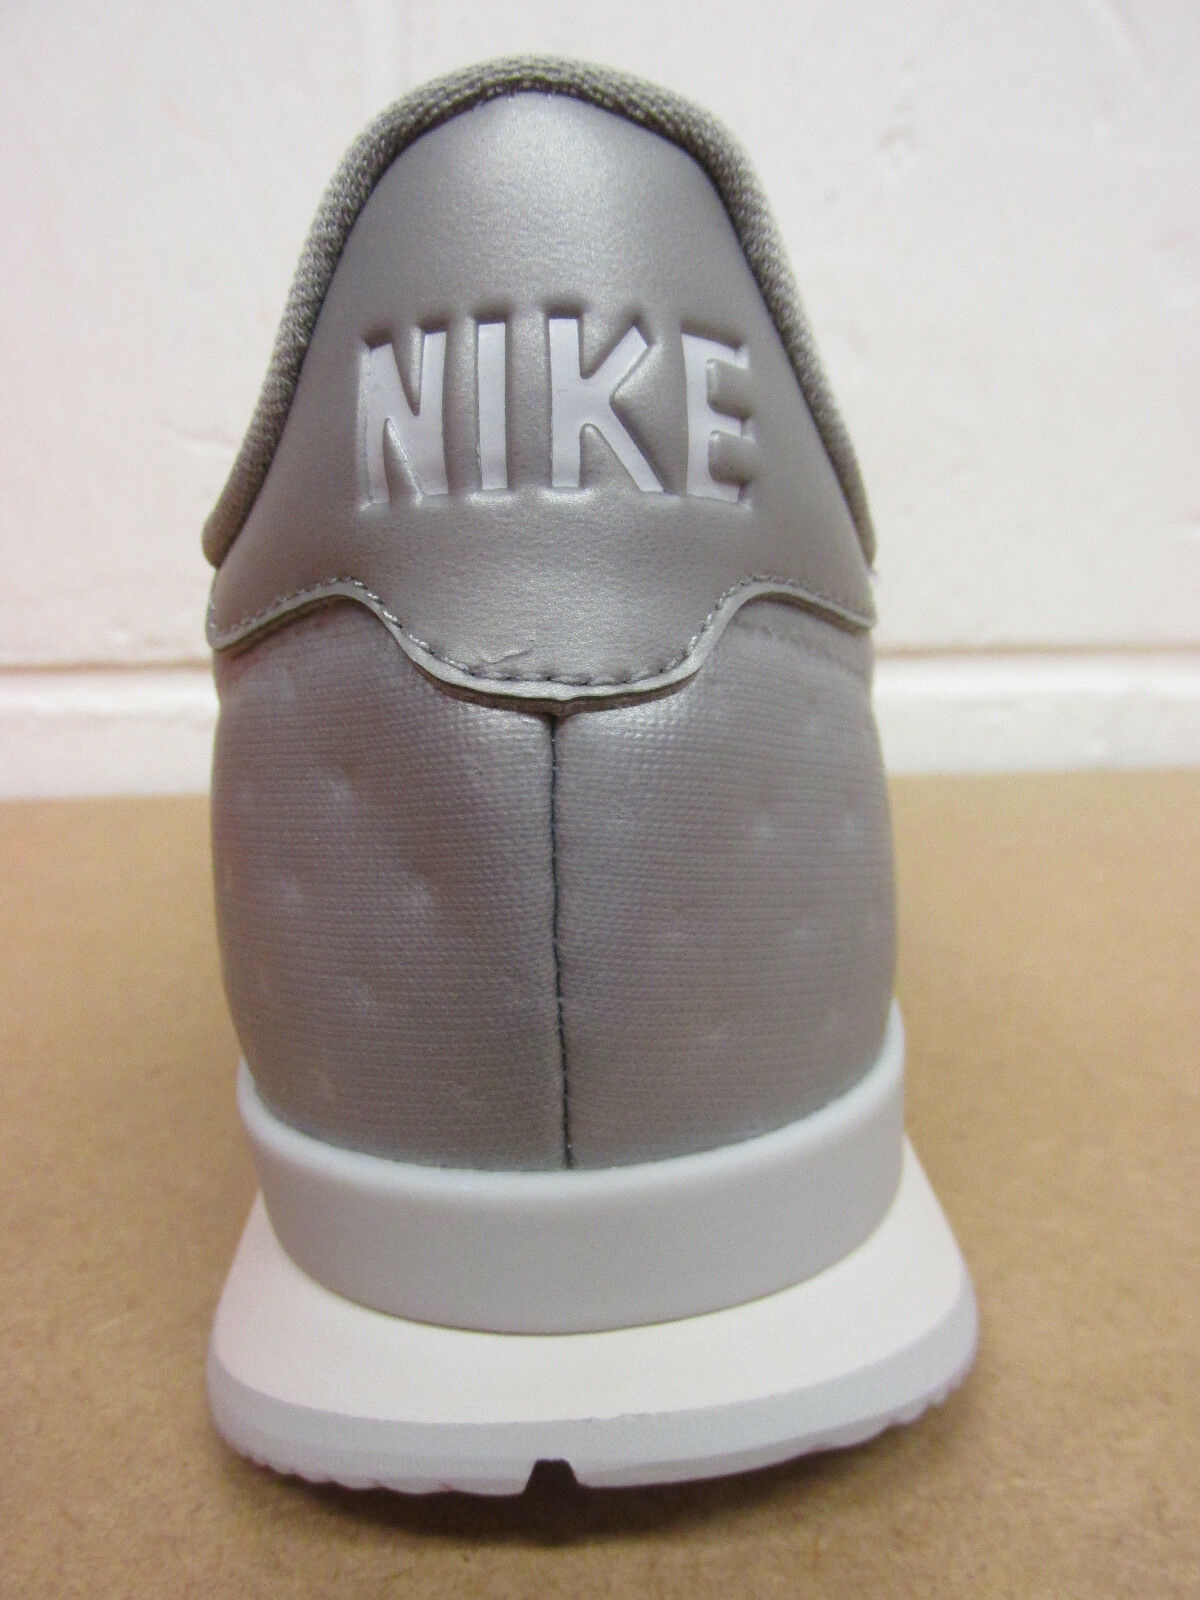 Nike Mujer Internationalist Jcrd Invierno Zapatillas 859544 001 Zapatillas Zapatillas Zapatillas 935445